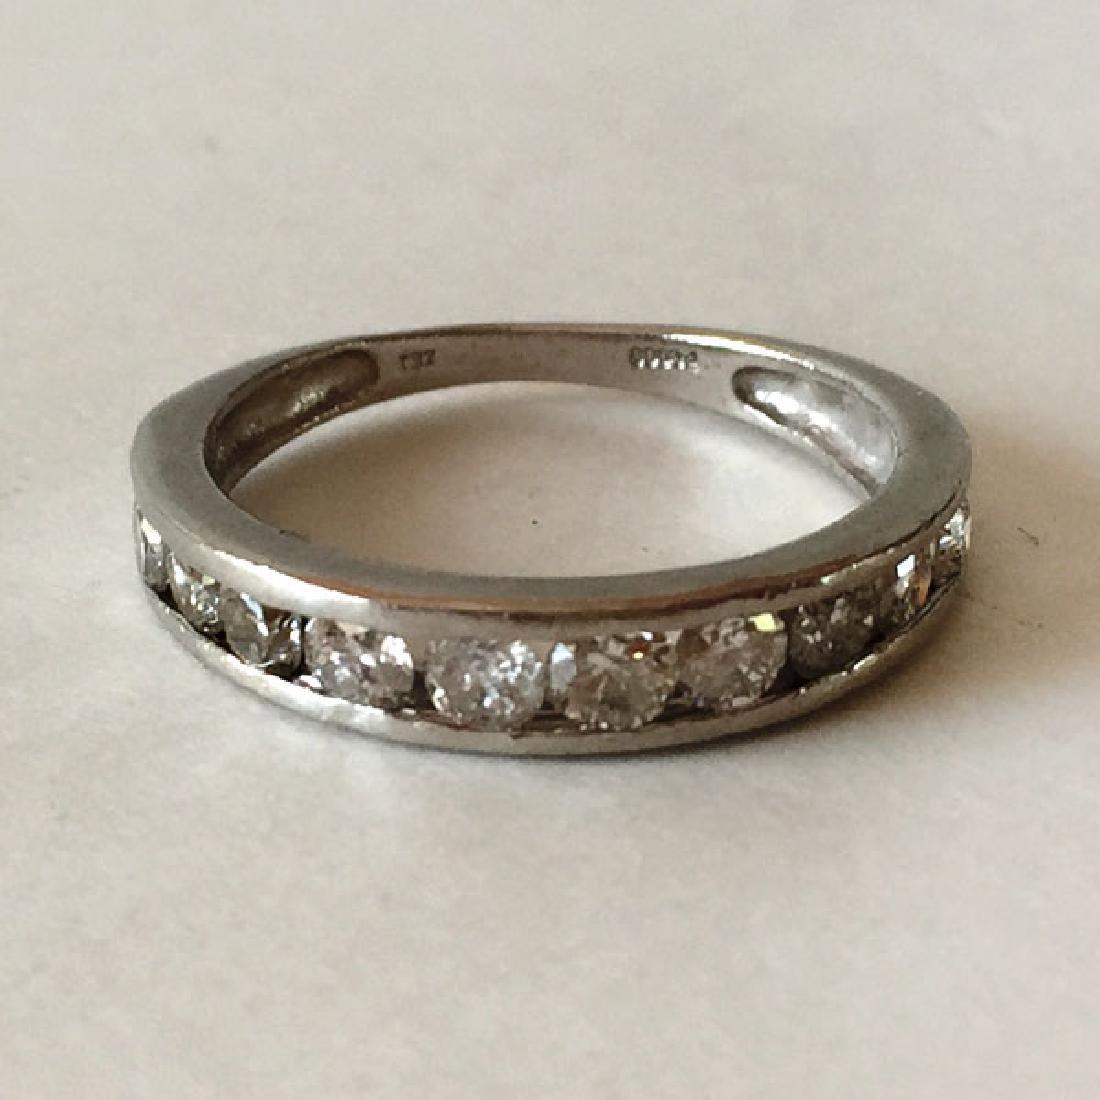 "Platinum diamond ring, size 7 1/4"", signed ZEI."